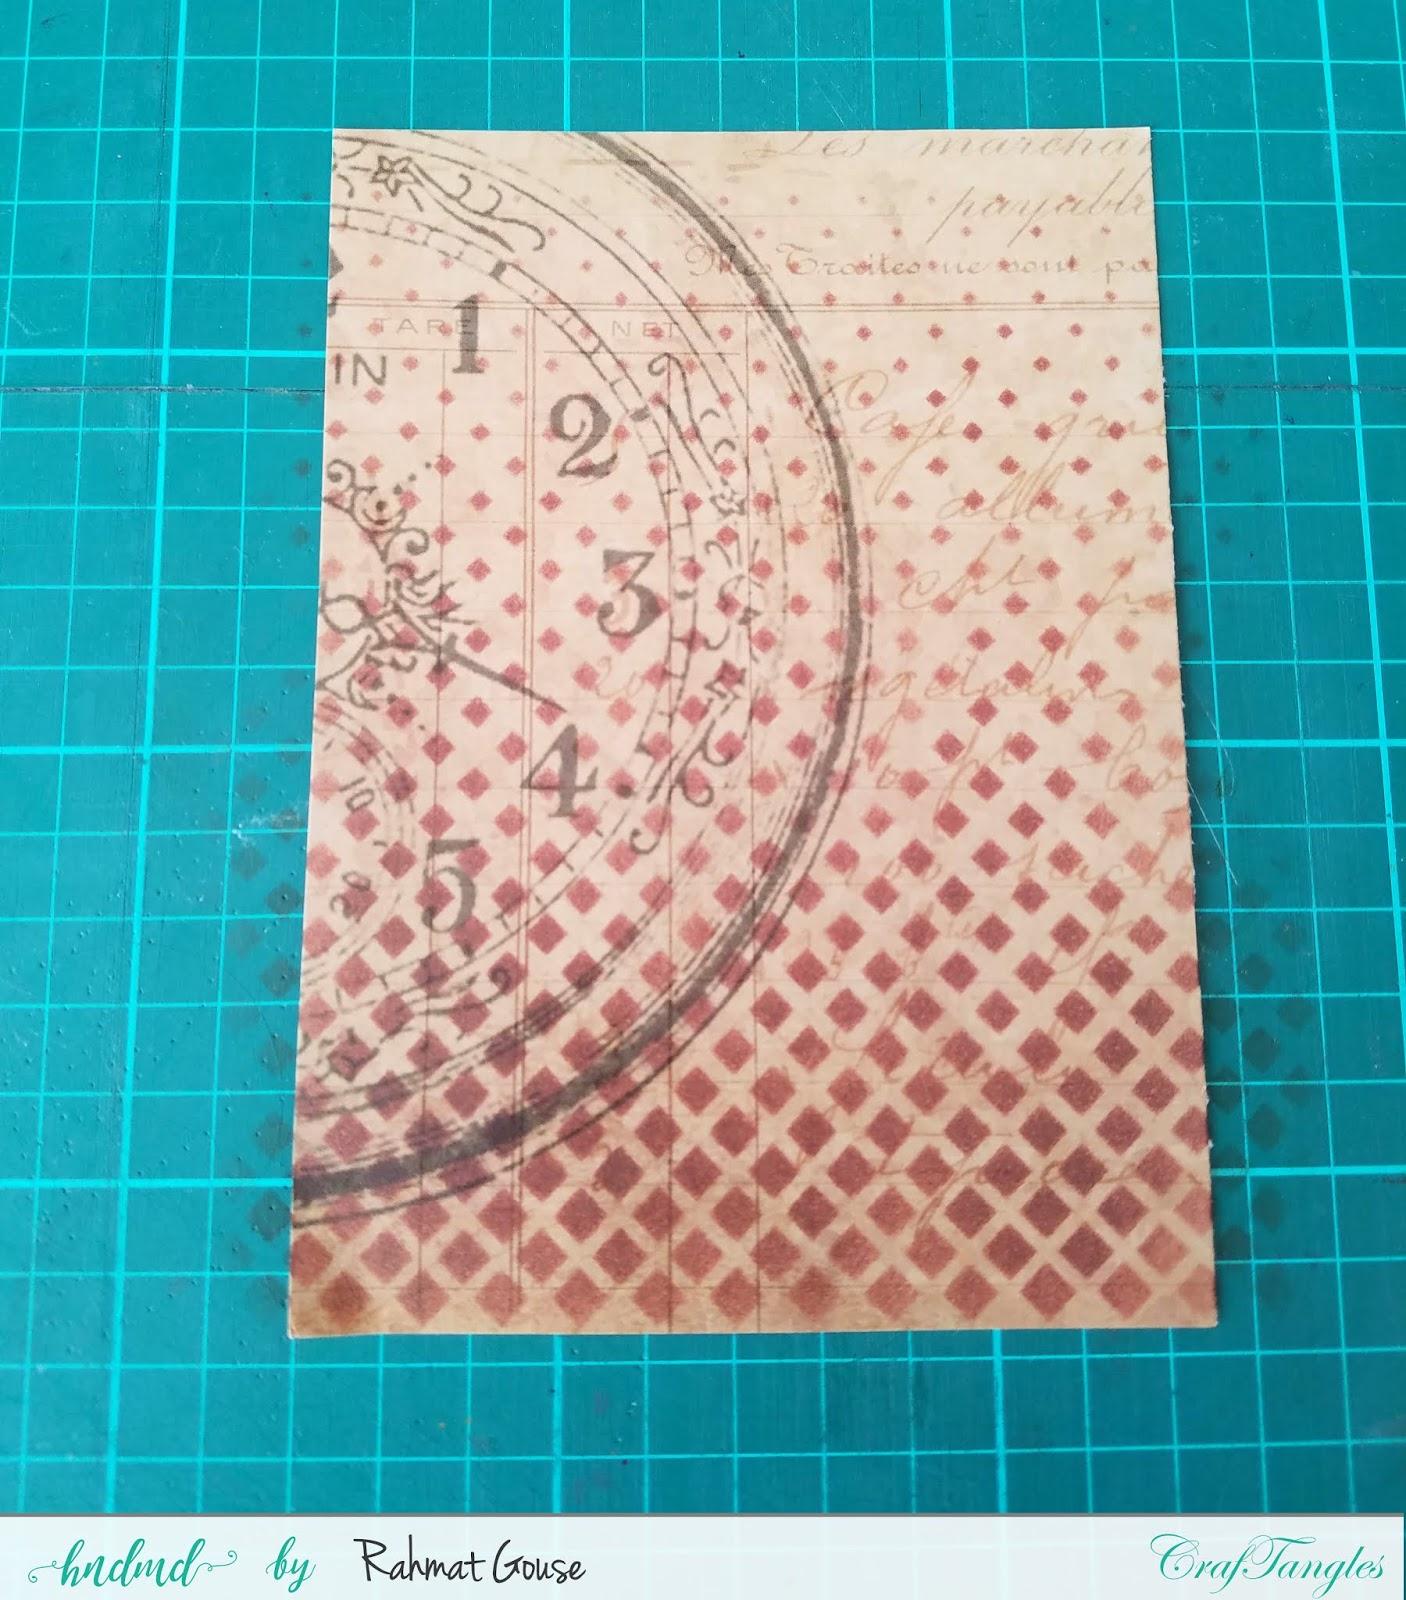 Focus on Foils with different techniques 4